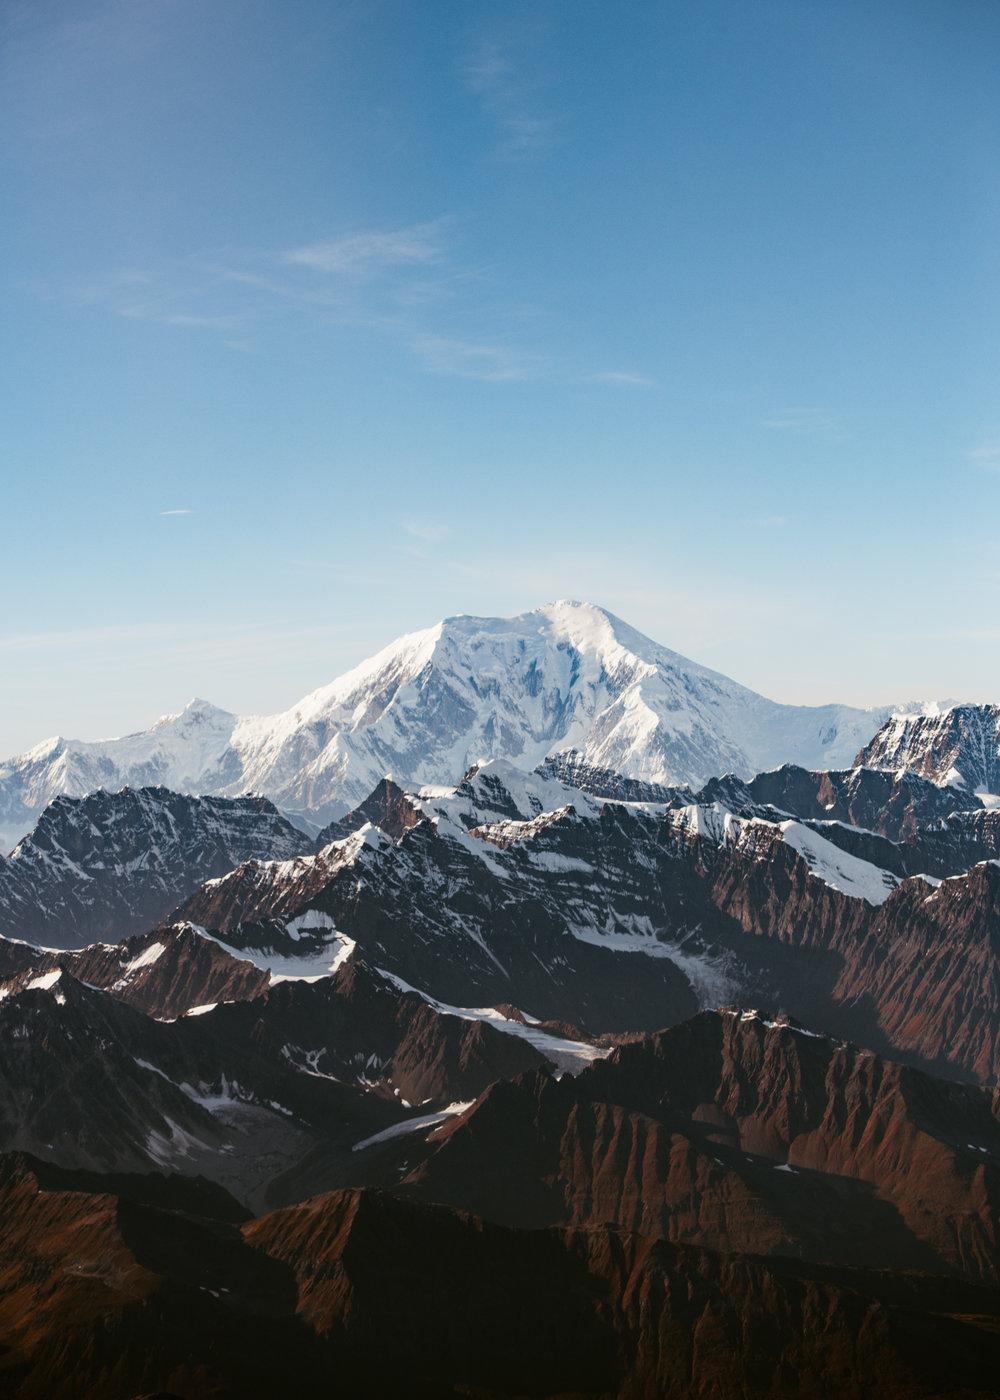 Getting closer to Denali (Mount McKinley)